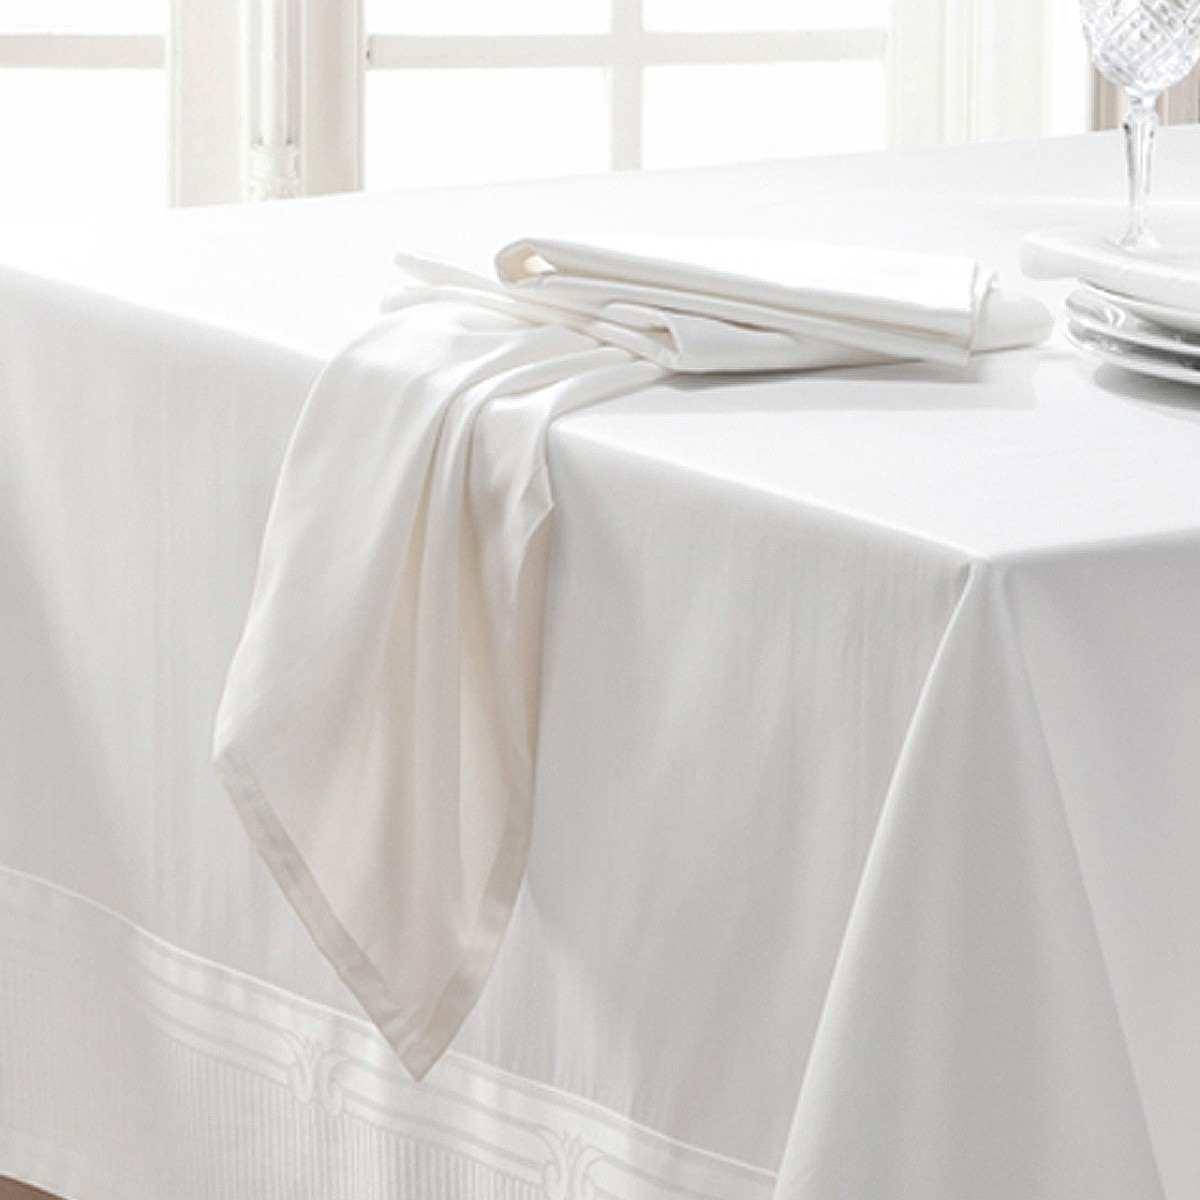 Serviette Table Scenariste